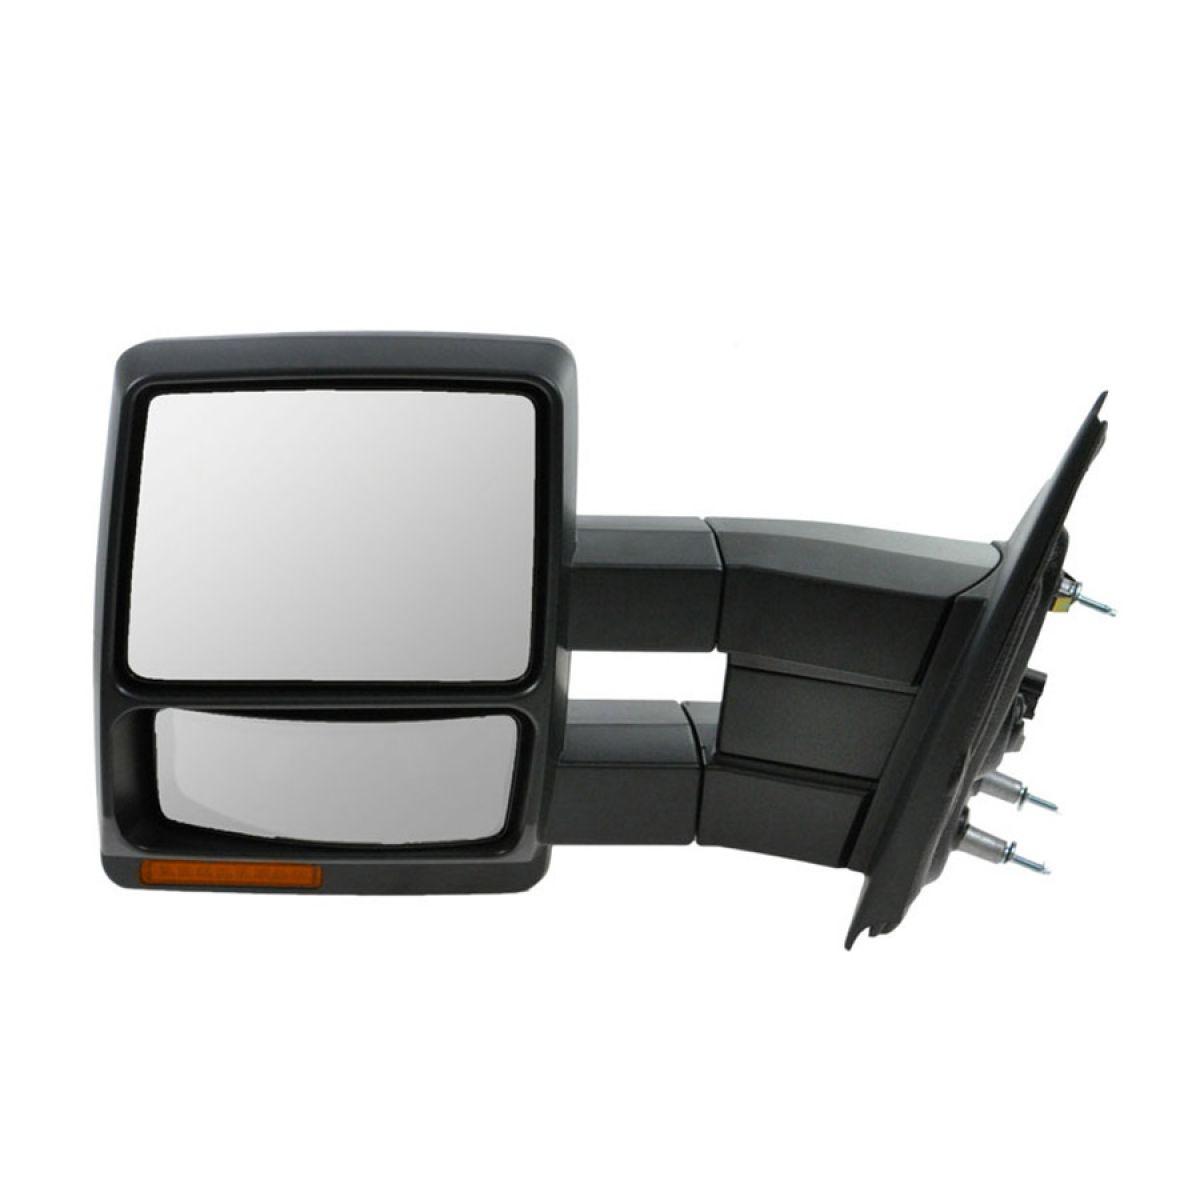 F350 Tow Mirror Wiring Diagram Free Download Wiring Diagram